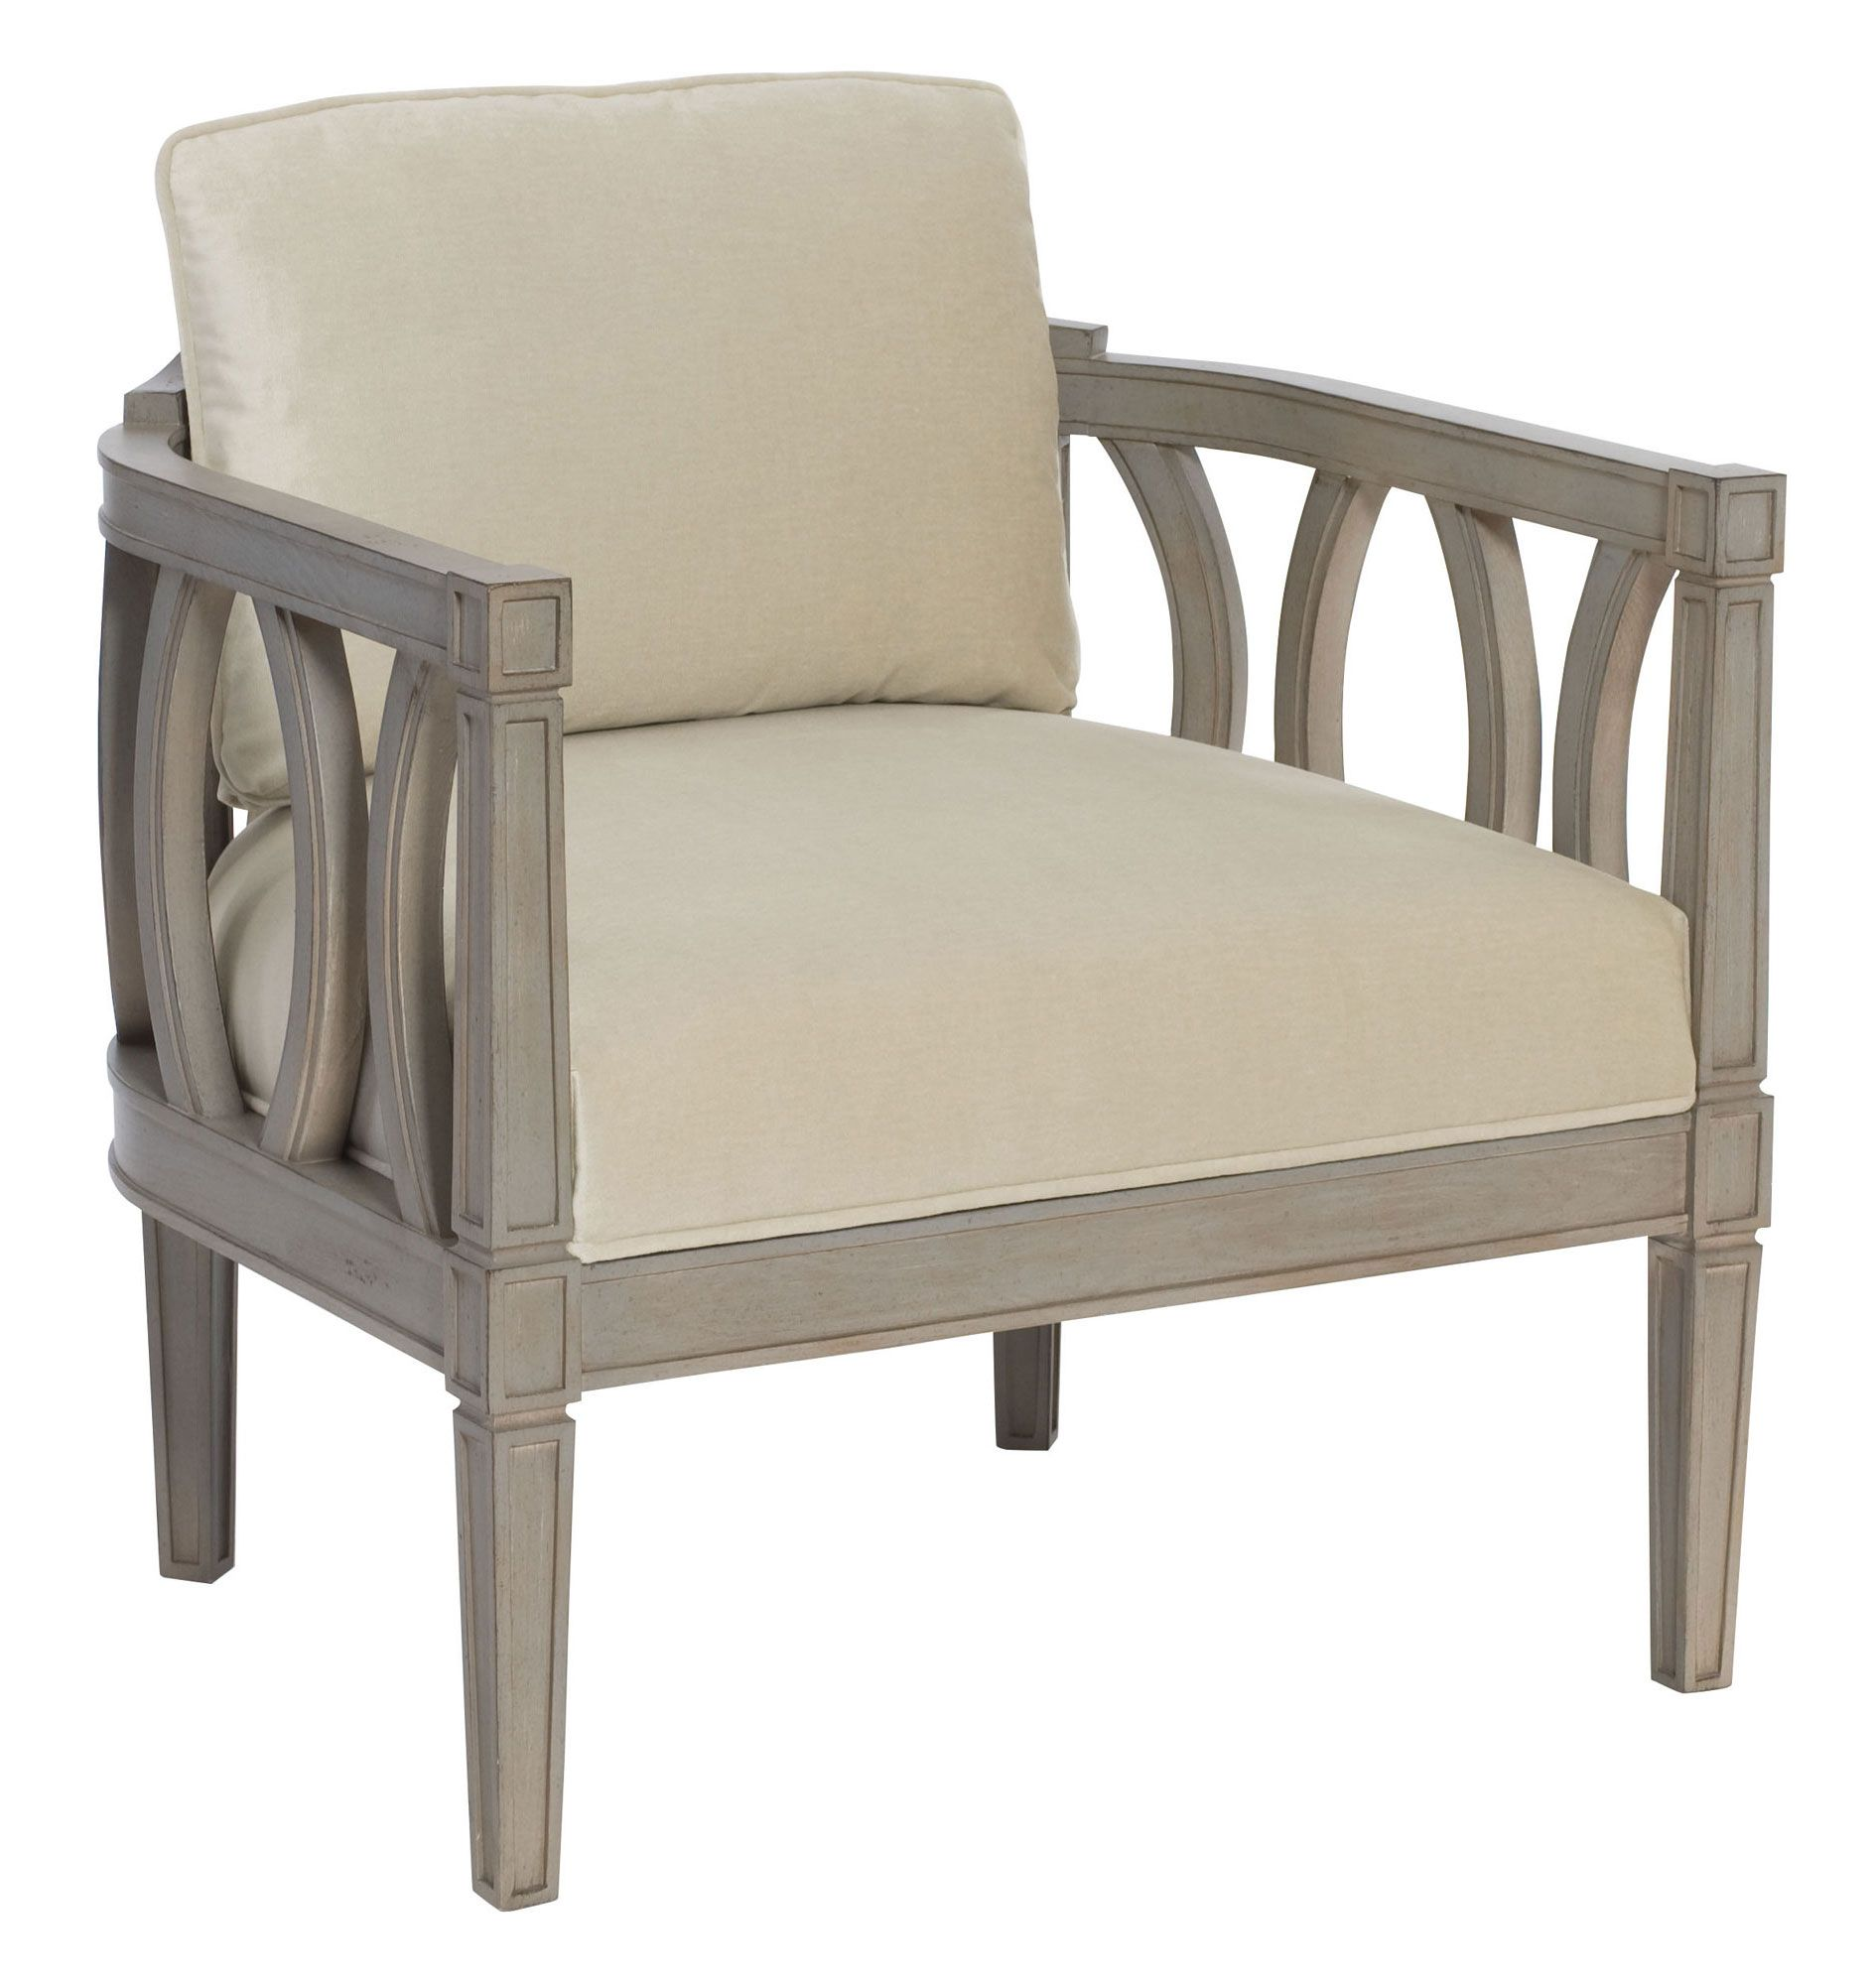 Ansley Chair | Bernhardt B8003 Fabric Shown 2838-002 W: 29.5 D 28 H ...